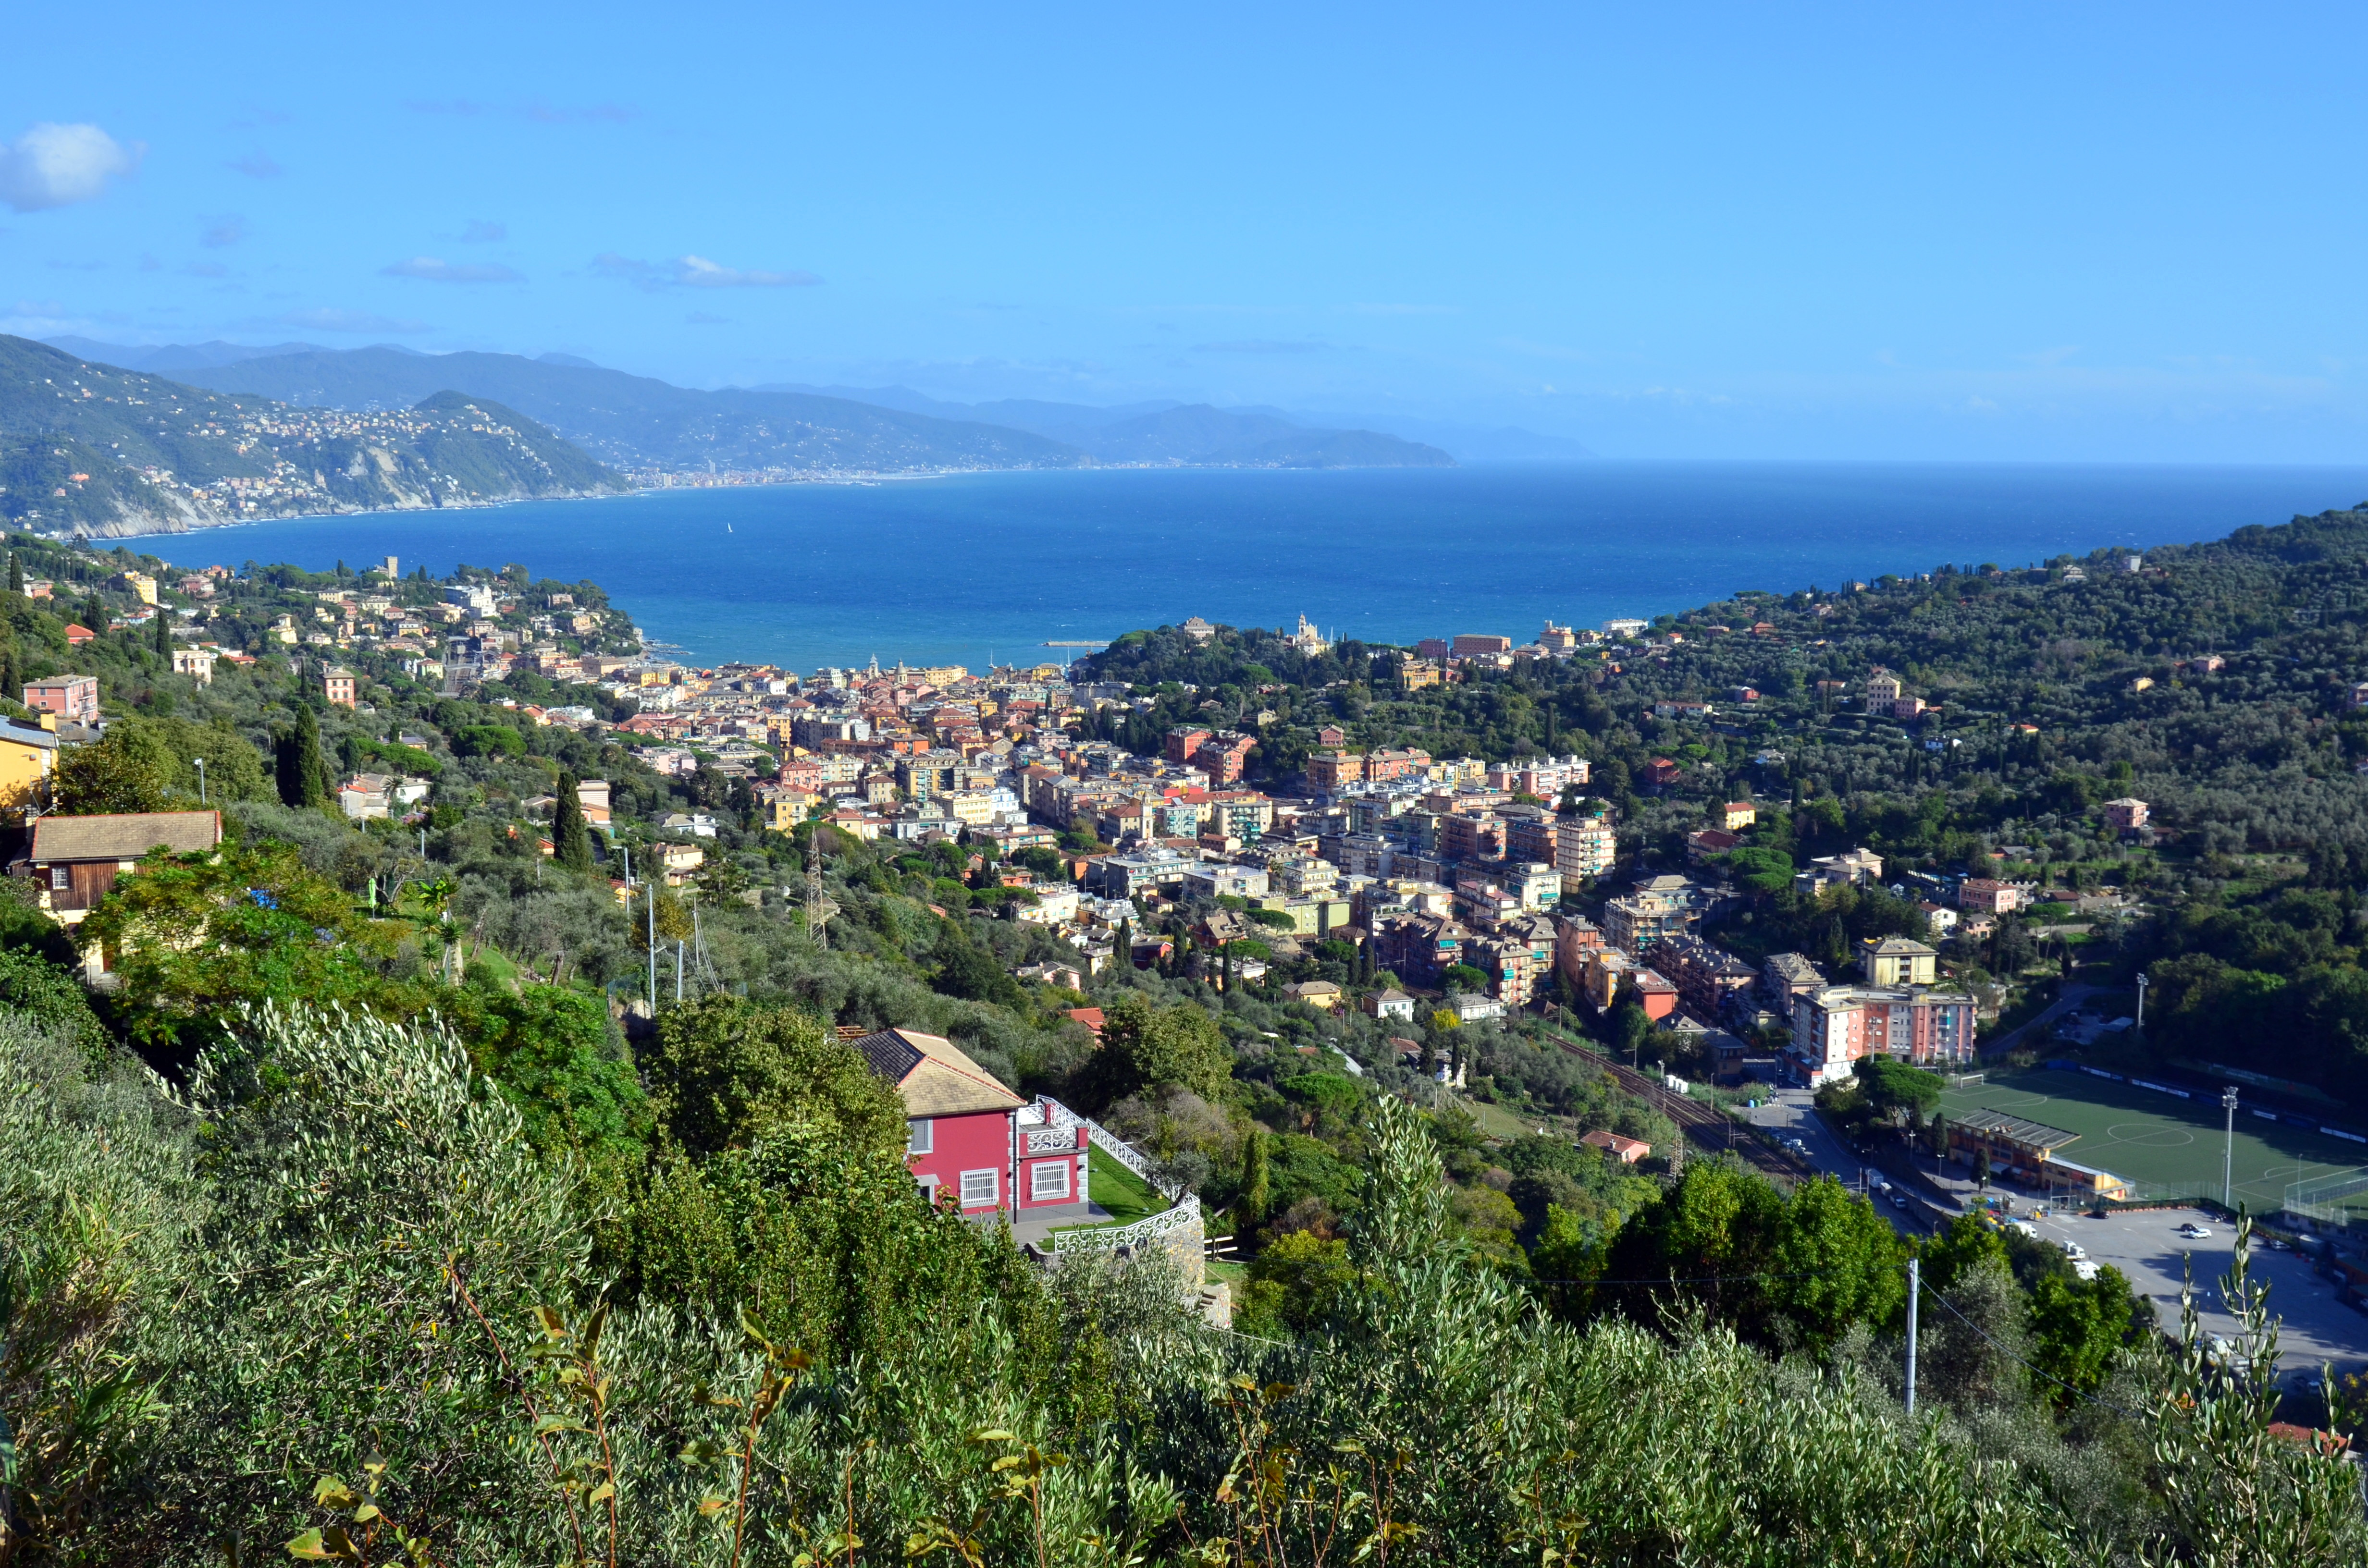 Santa Margherita Ligure Wikipedia